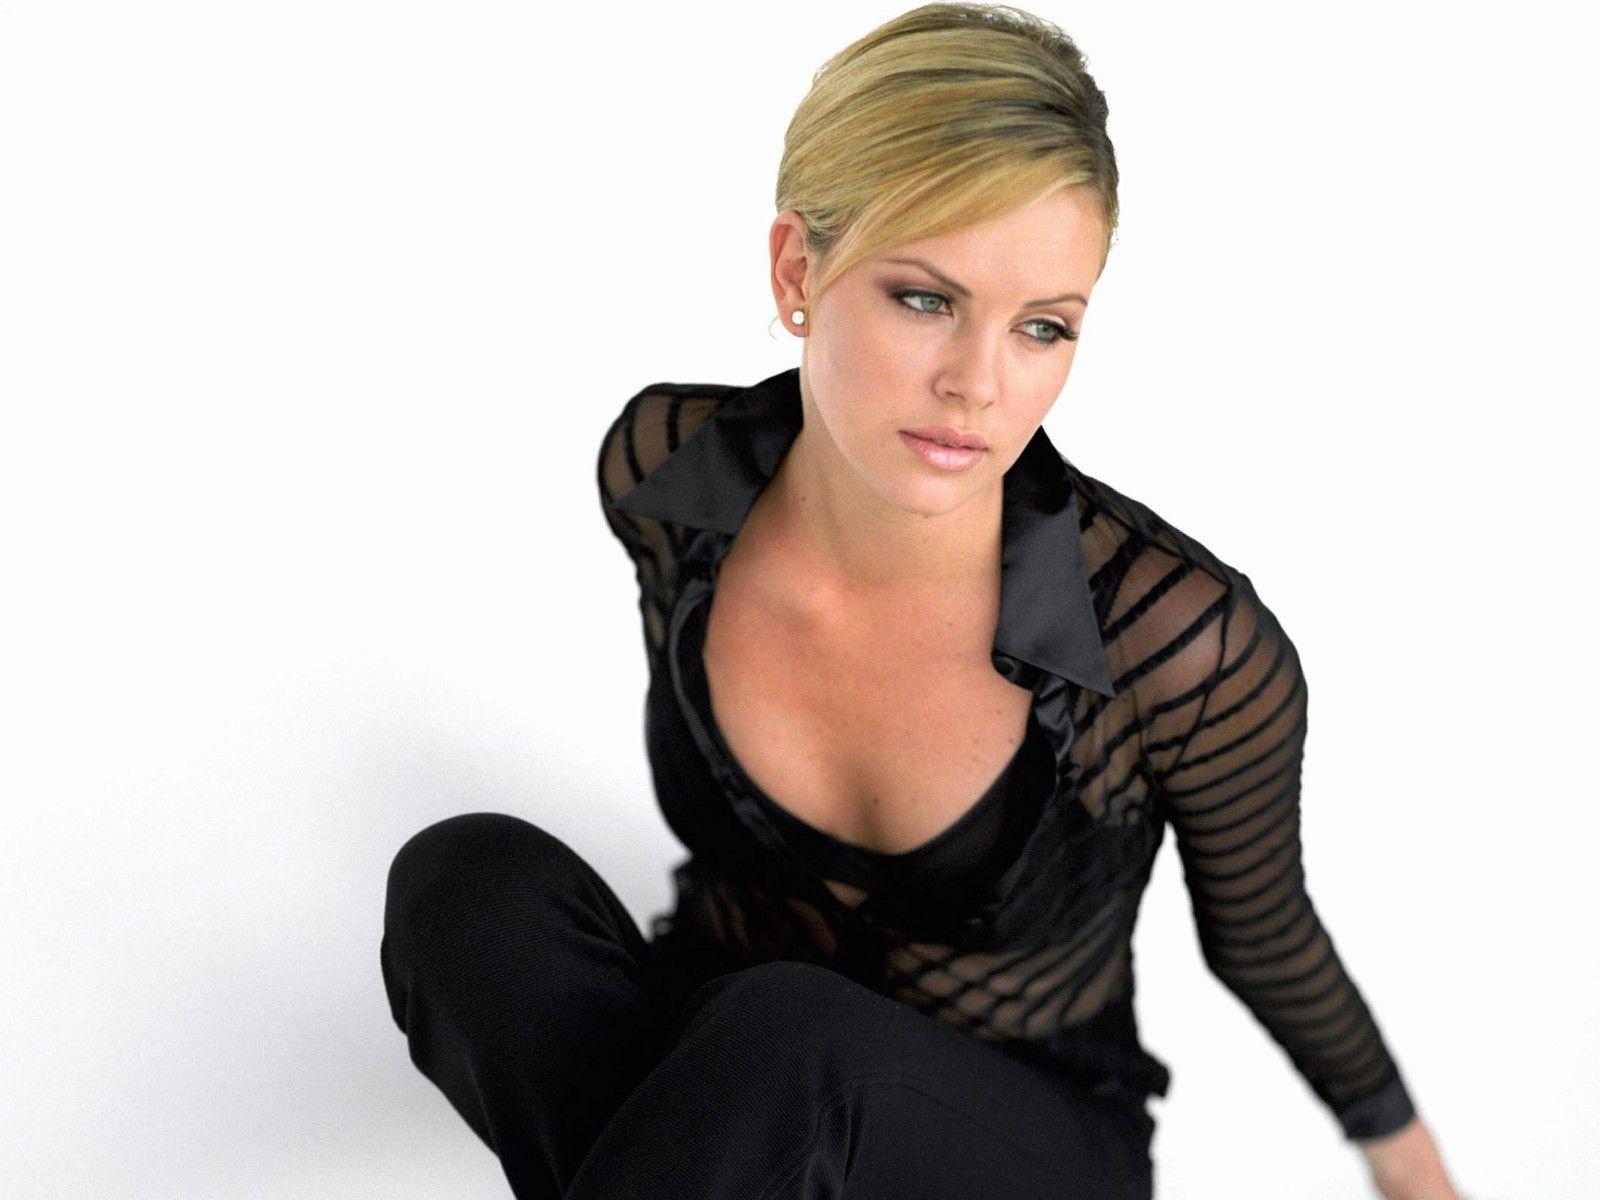 http://2.bp.blogspot.com/-XGjNh4nHK30/UAGcZPdXk2I/AAAAAAAABCs/kGji9iJ1YUc/s1600/Charlize-Theron-Sexy-Wallpapers-1.jpg